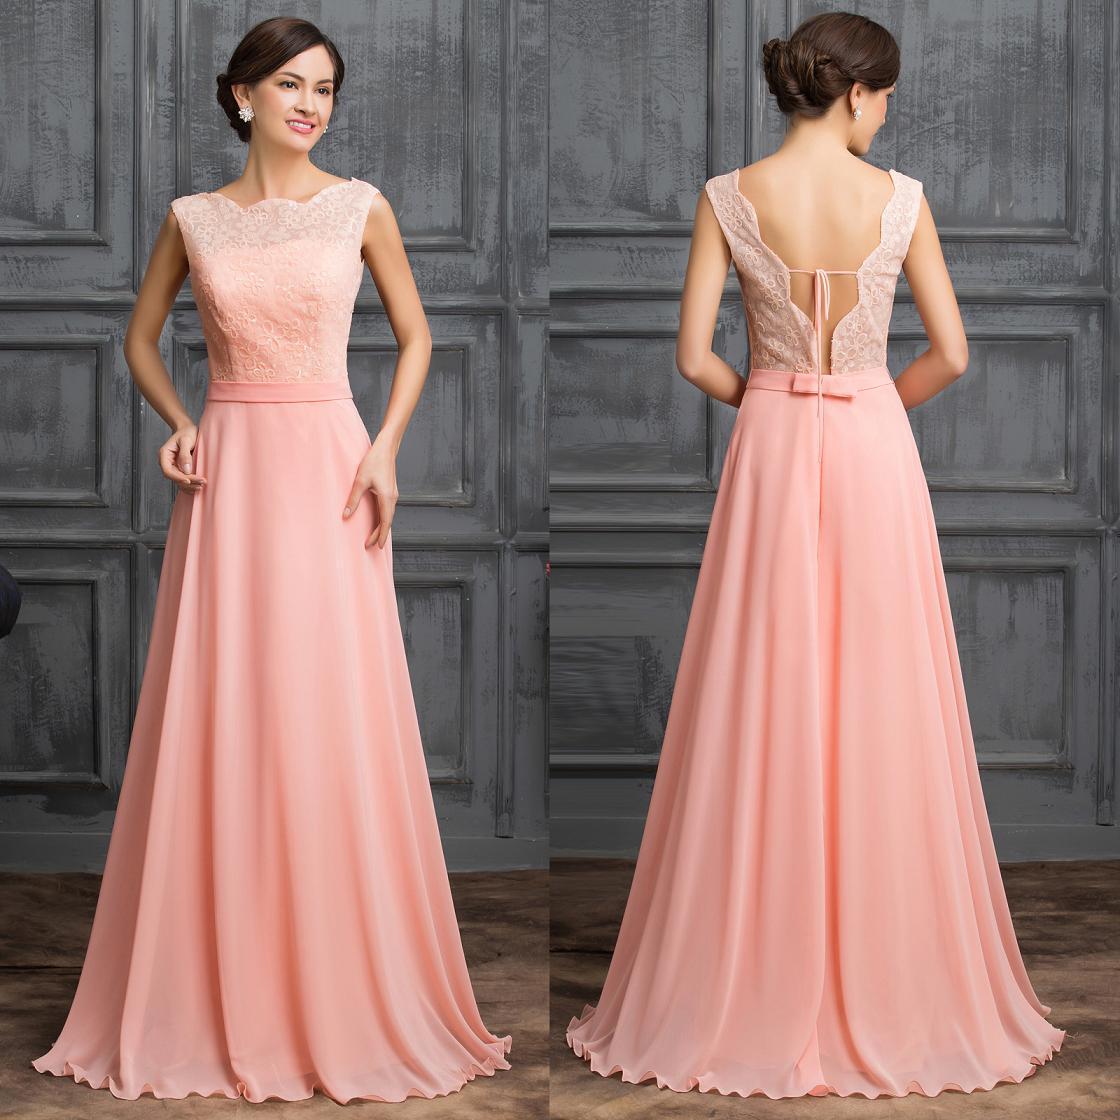 Compre Grace Karin 2016 Rosa Claro Chic Largo Vestido De Noche ...